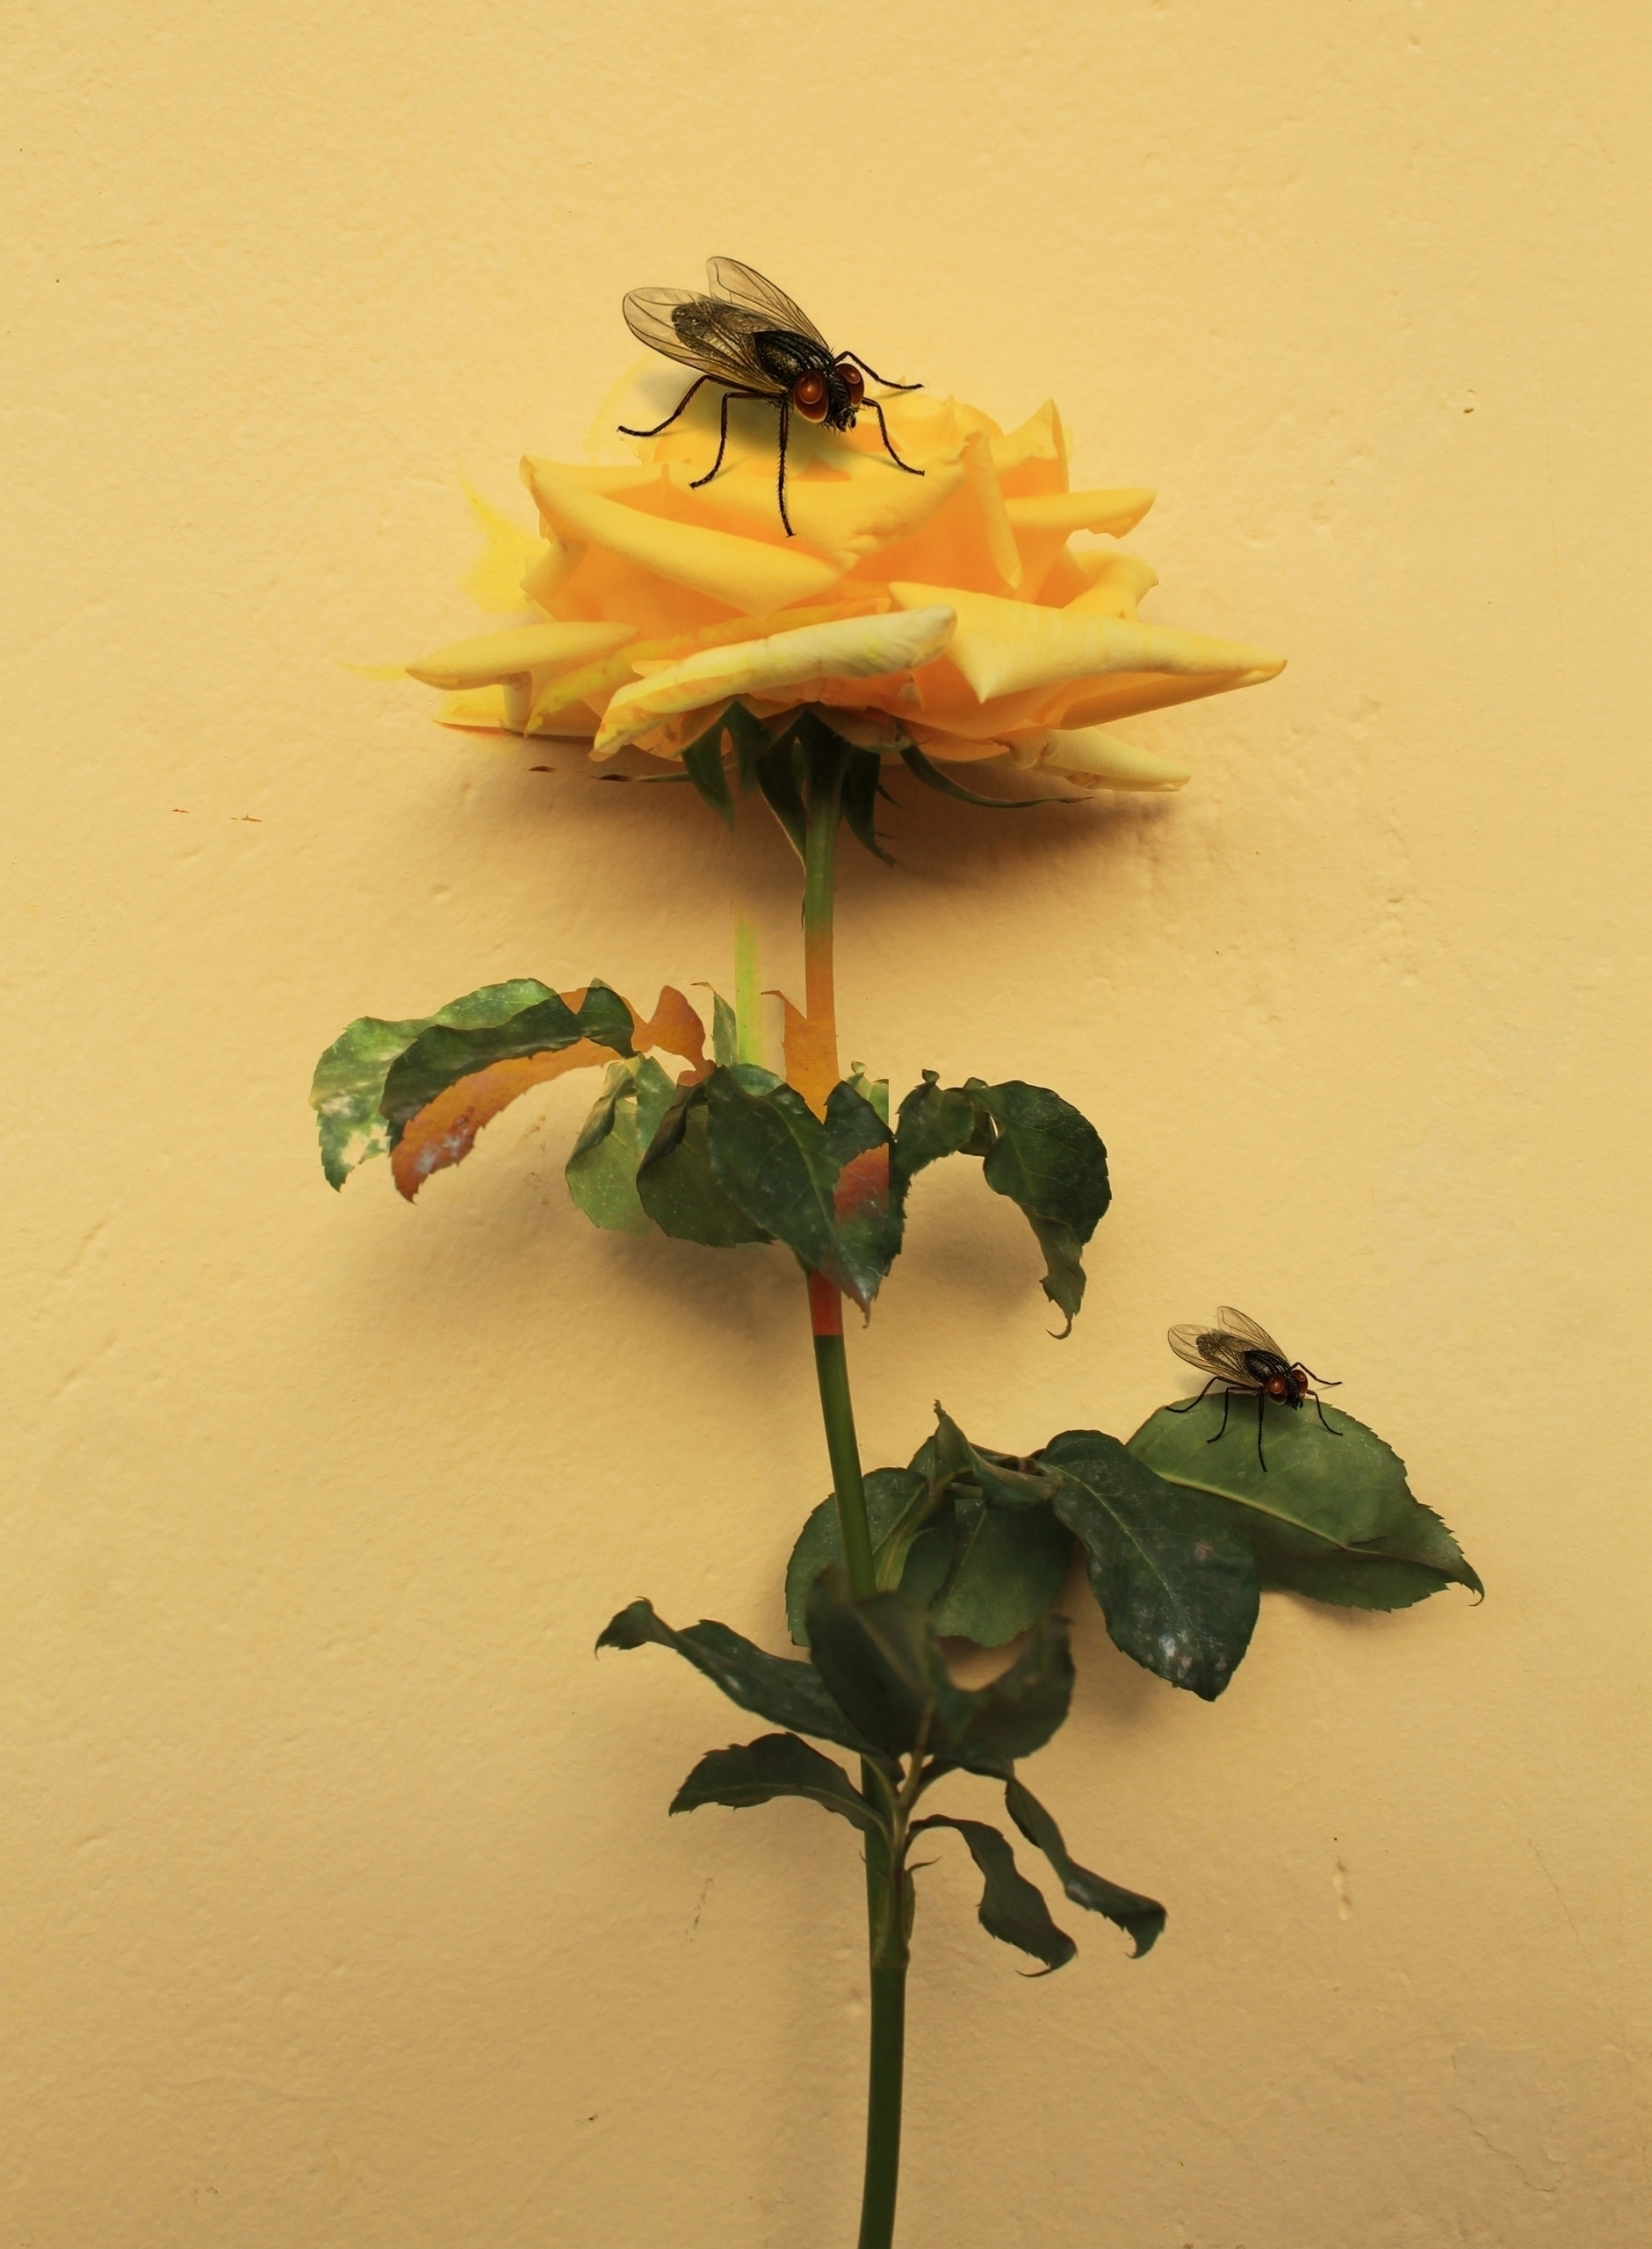 Spring - digitalcollage, flower - franalvez   ello